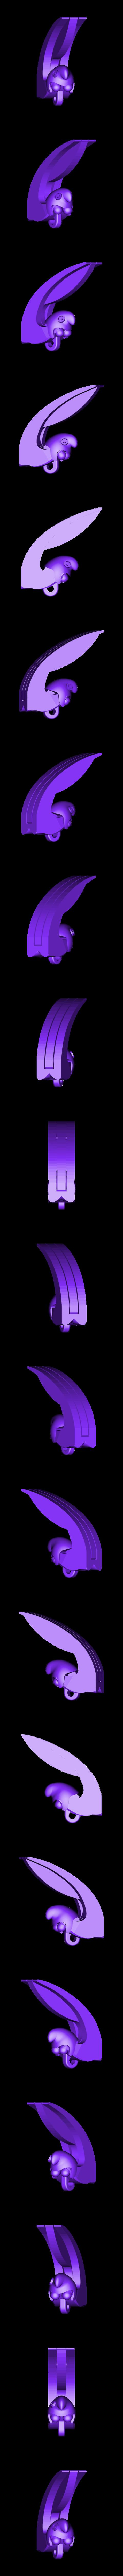 STRATI MARIANNE.stl Download free STL file STRATI • 3D printer template, DJER